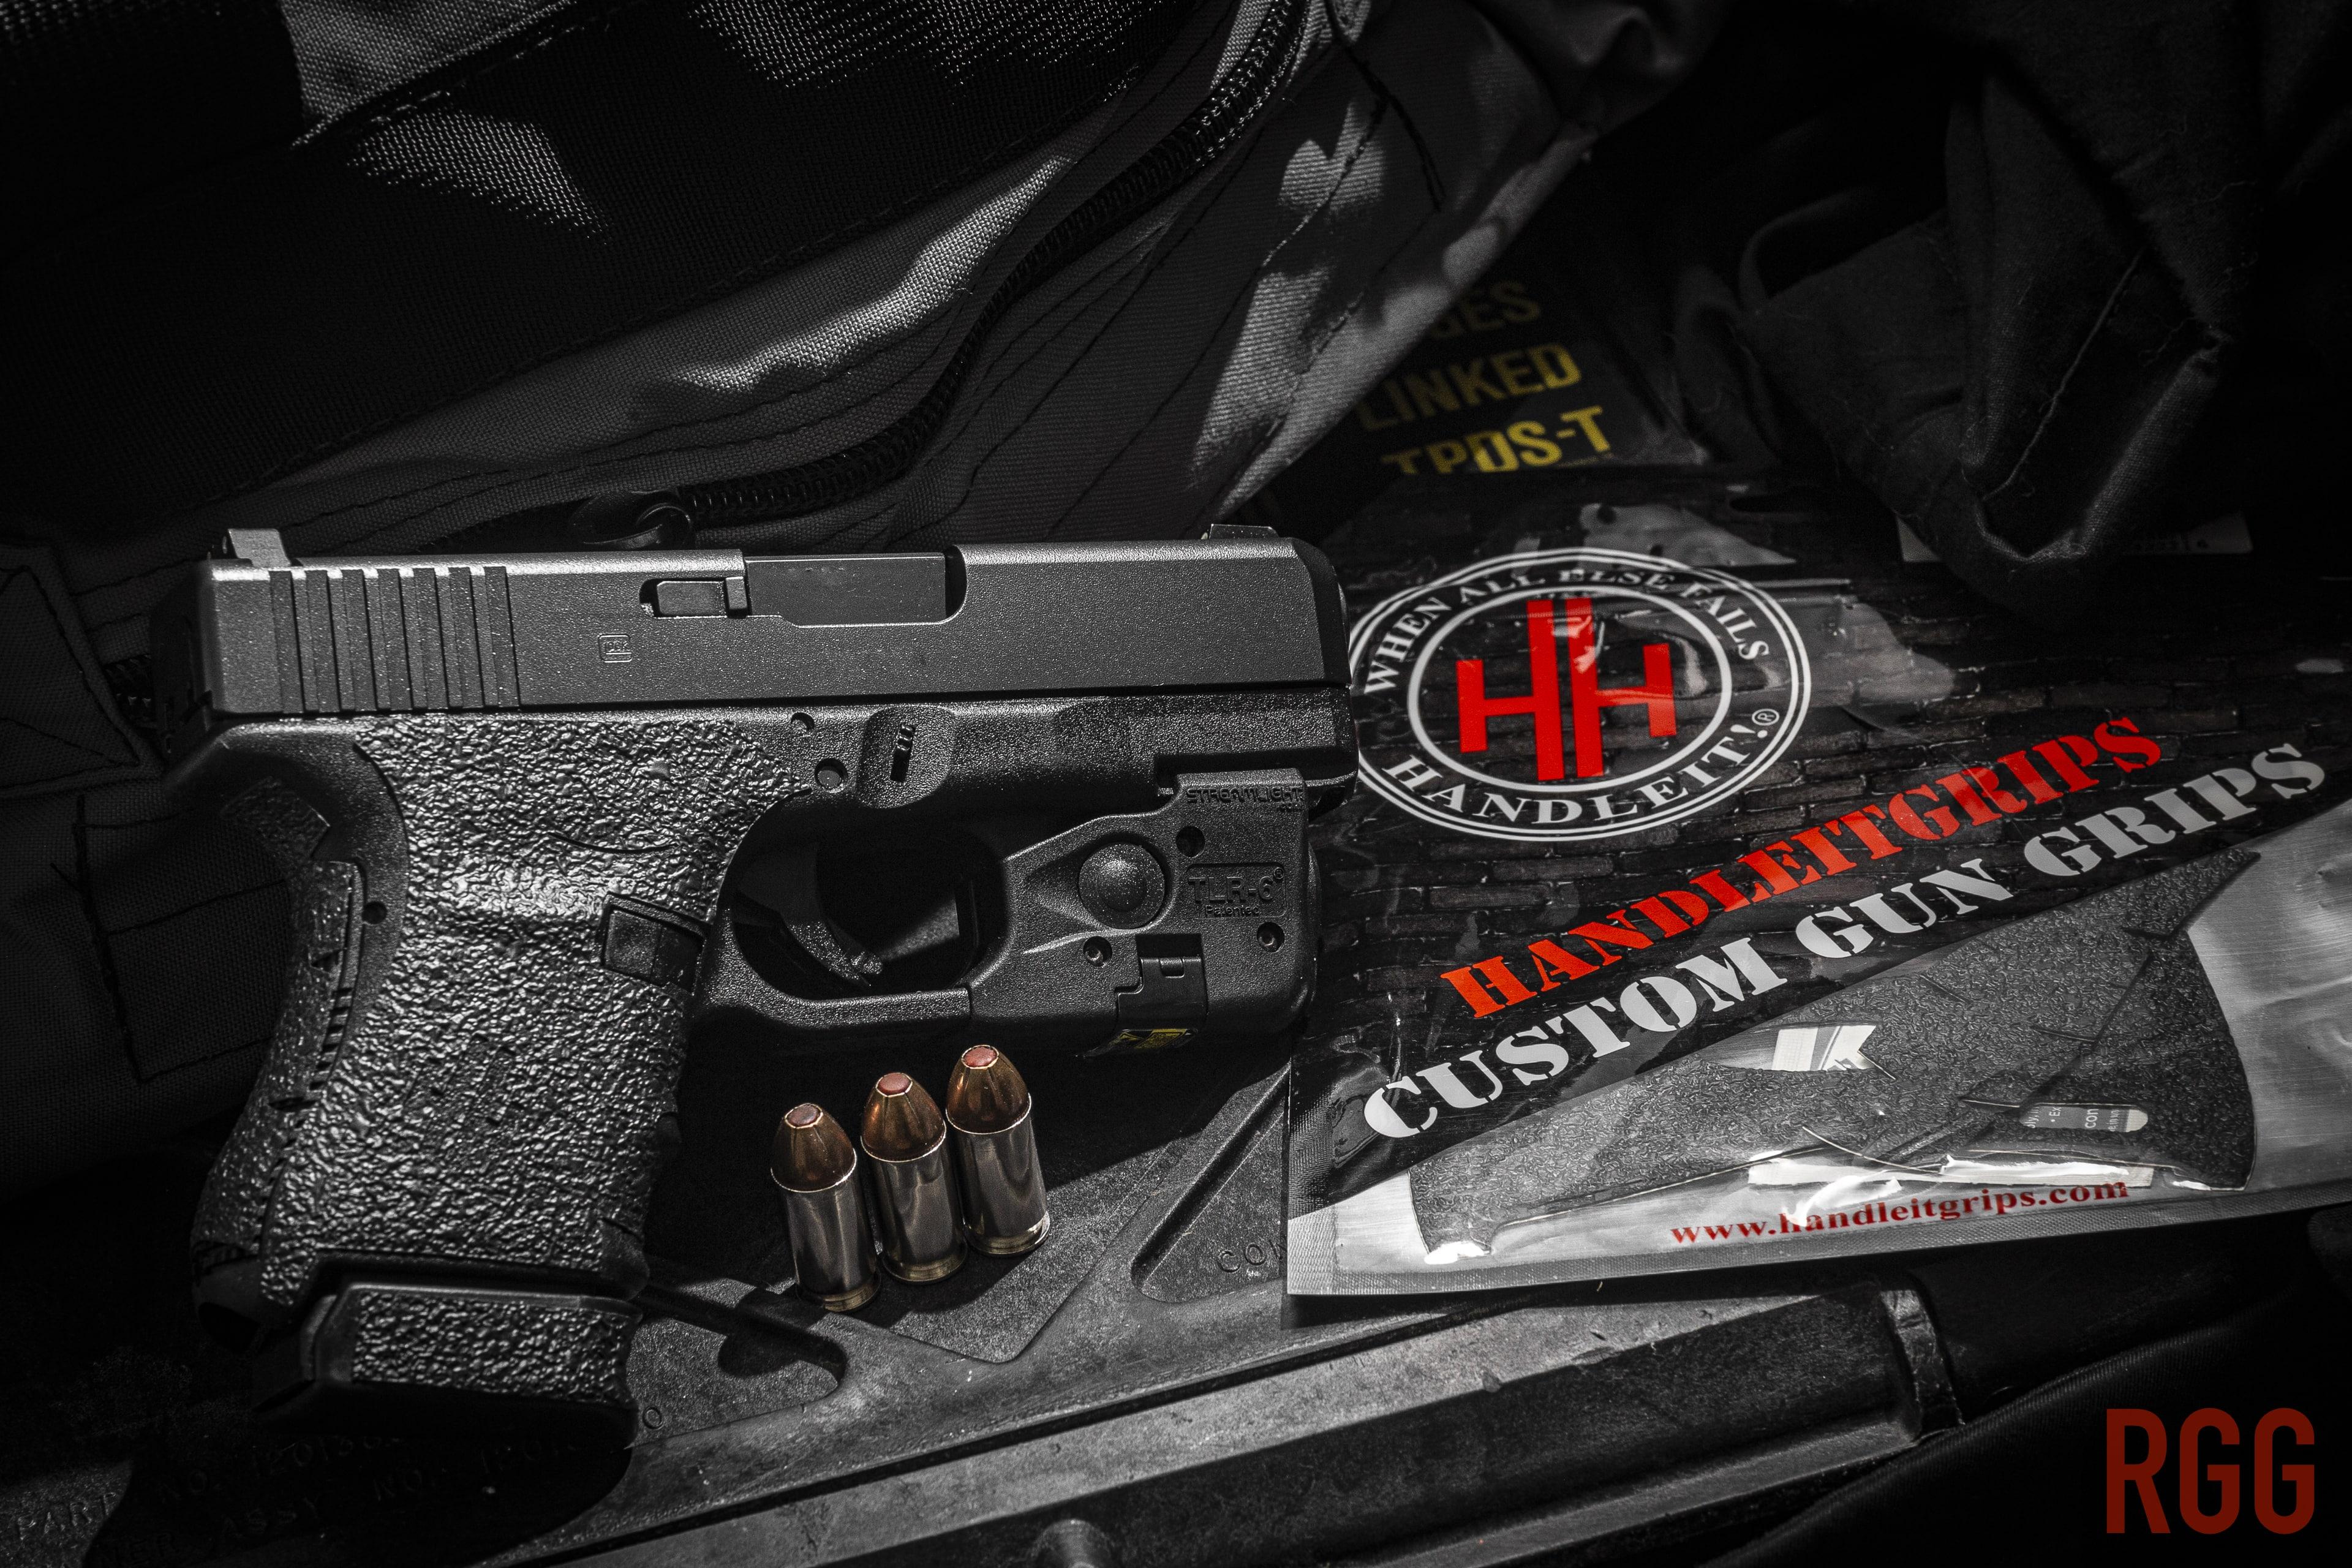 The HandleItGrips adhesive gun grip on a GLOCK 30.